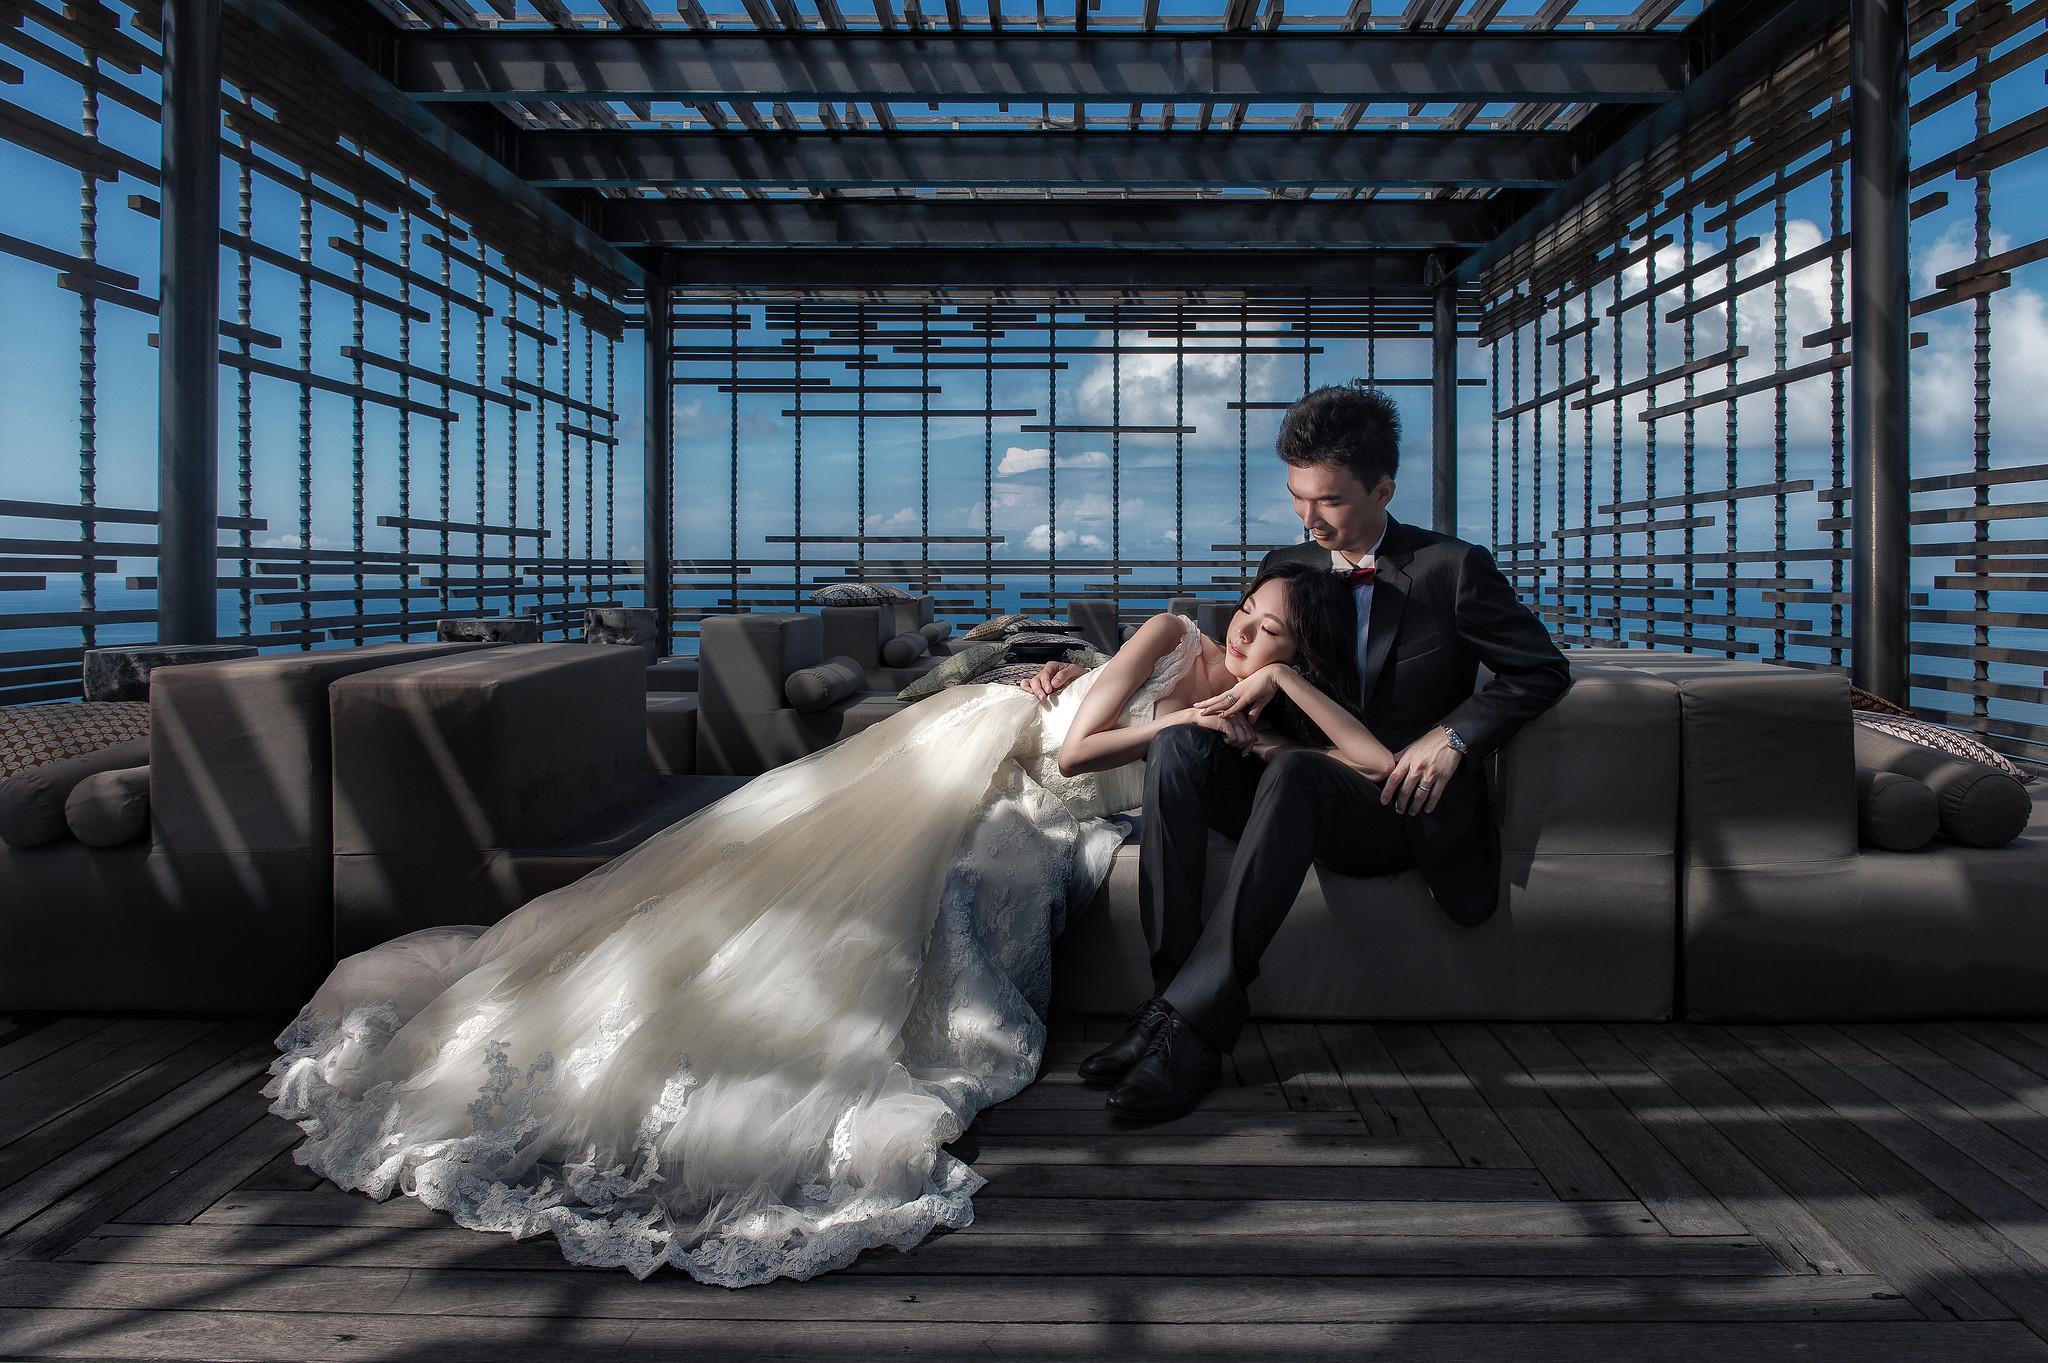 Donfer Photography, EASTERN WEDDING, 東法,bali婚紗, 峇里島婚紗 ,海外婚紗, 藝術婚紗